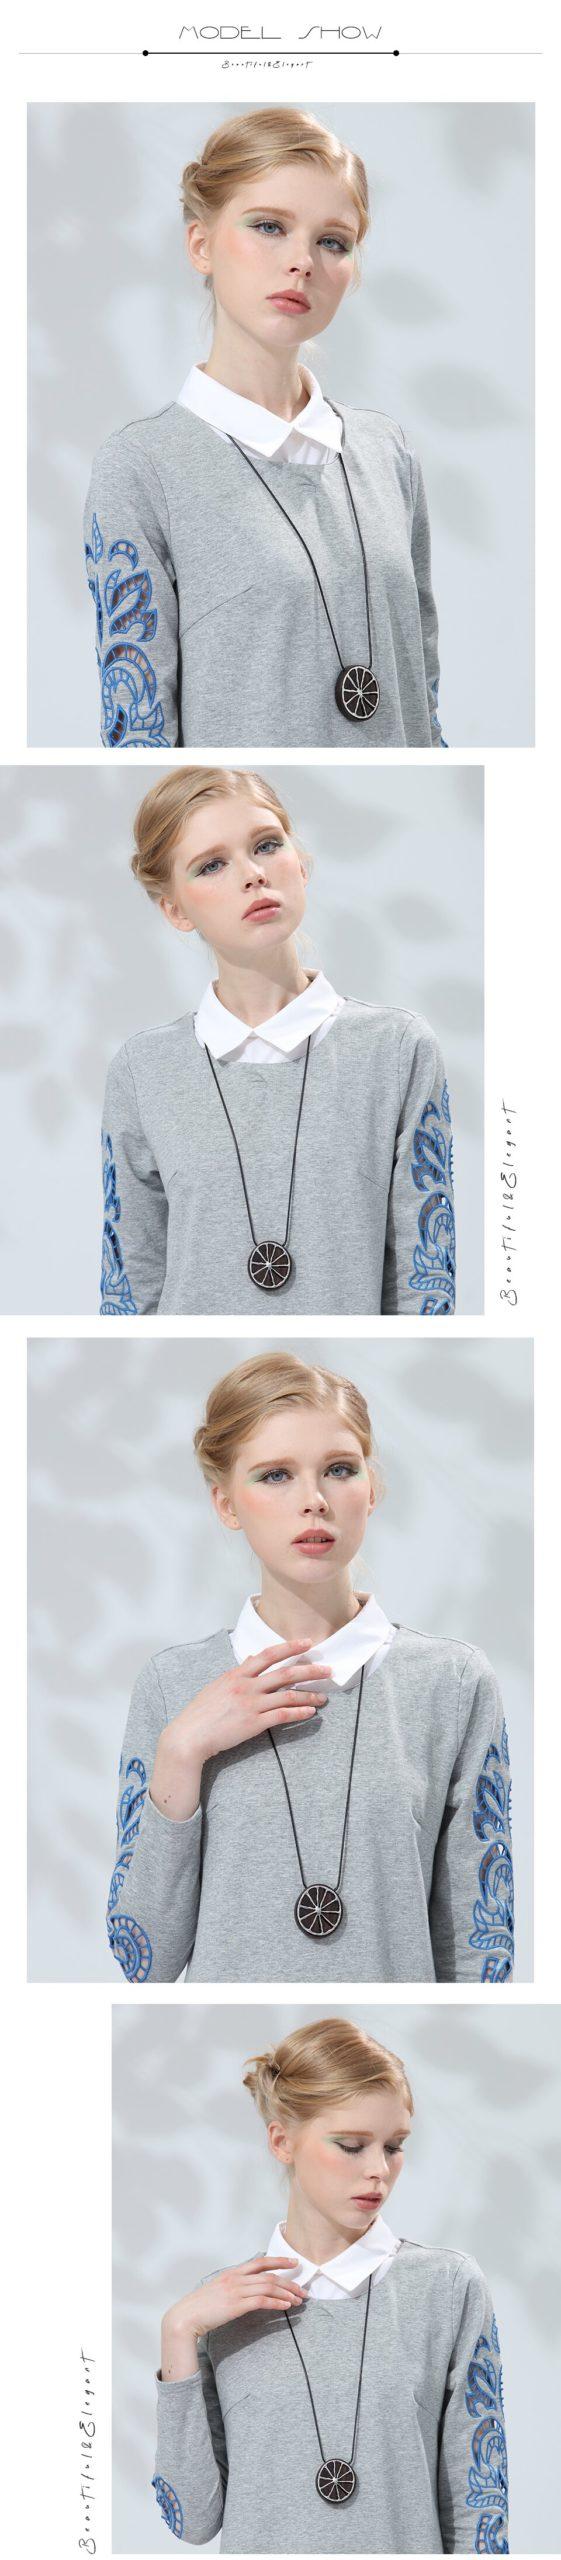 Necklace for Women Lemon Shape Wooden Pendant & Necklaces Handmade Sandalwood Vintage Long Sweater Chain Jewelry Fashion Pendant